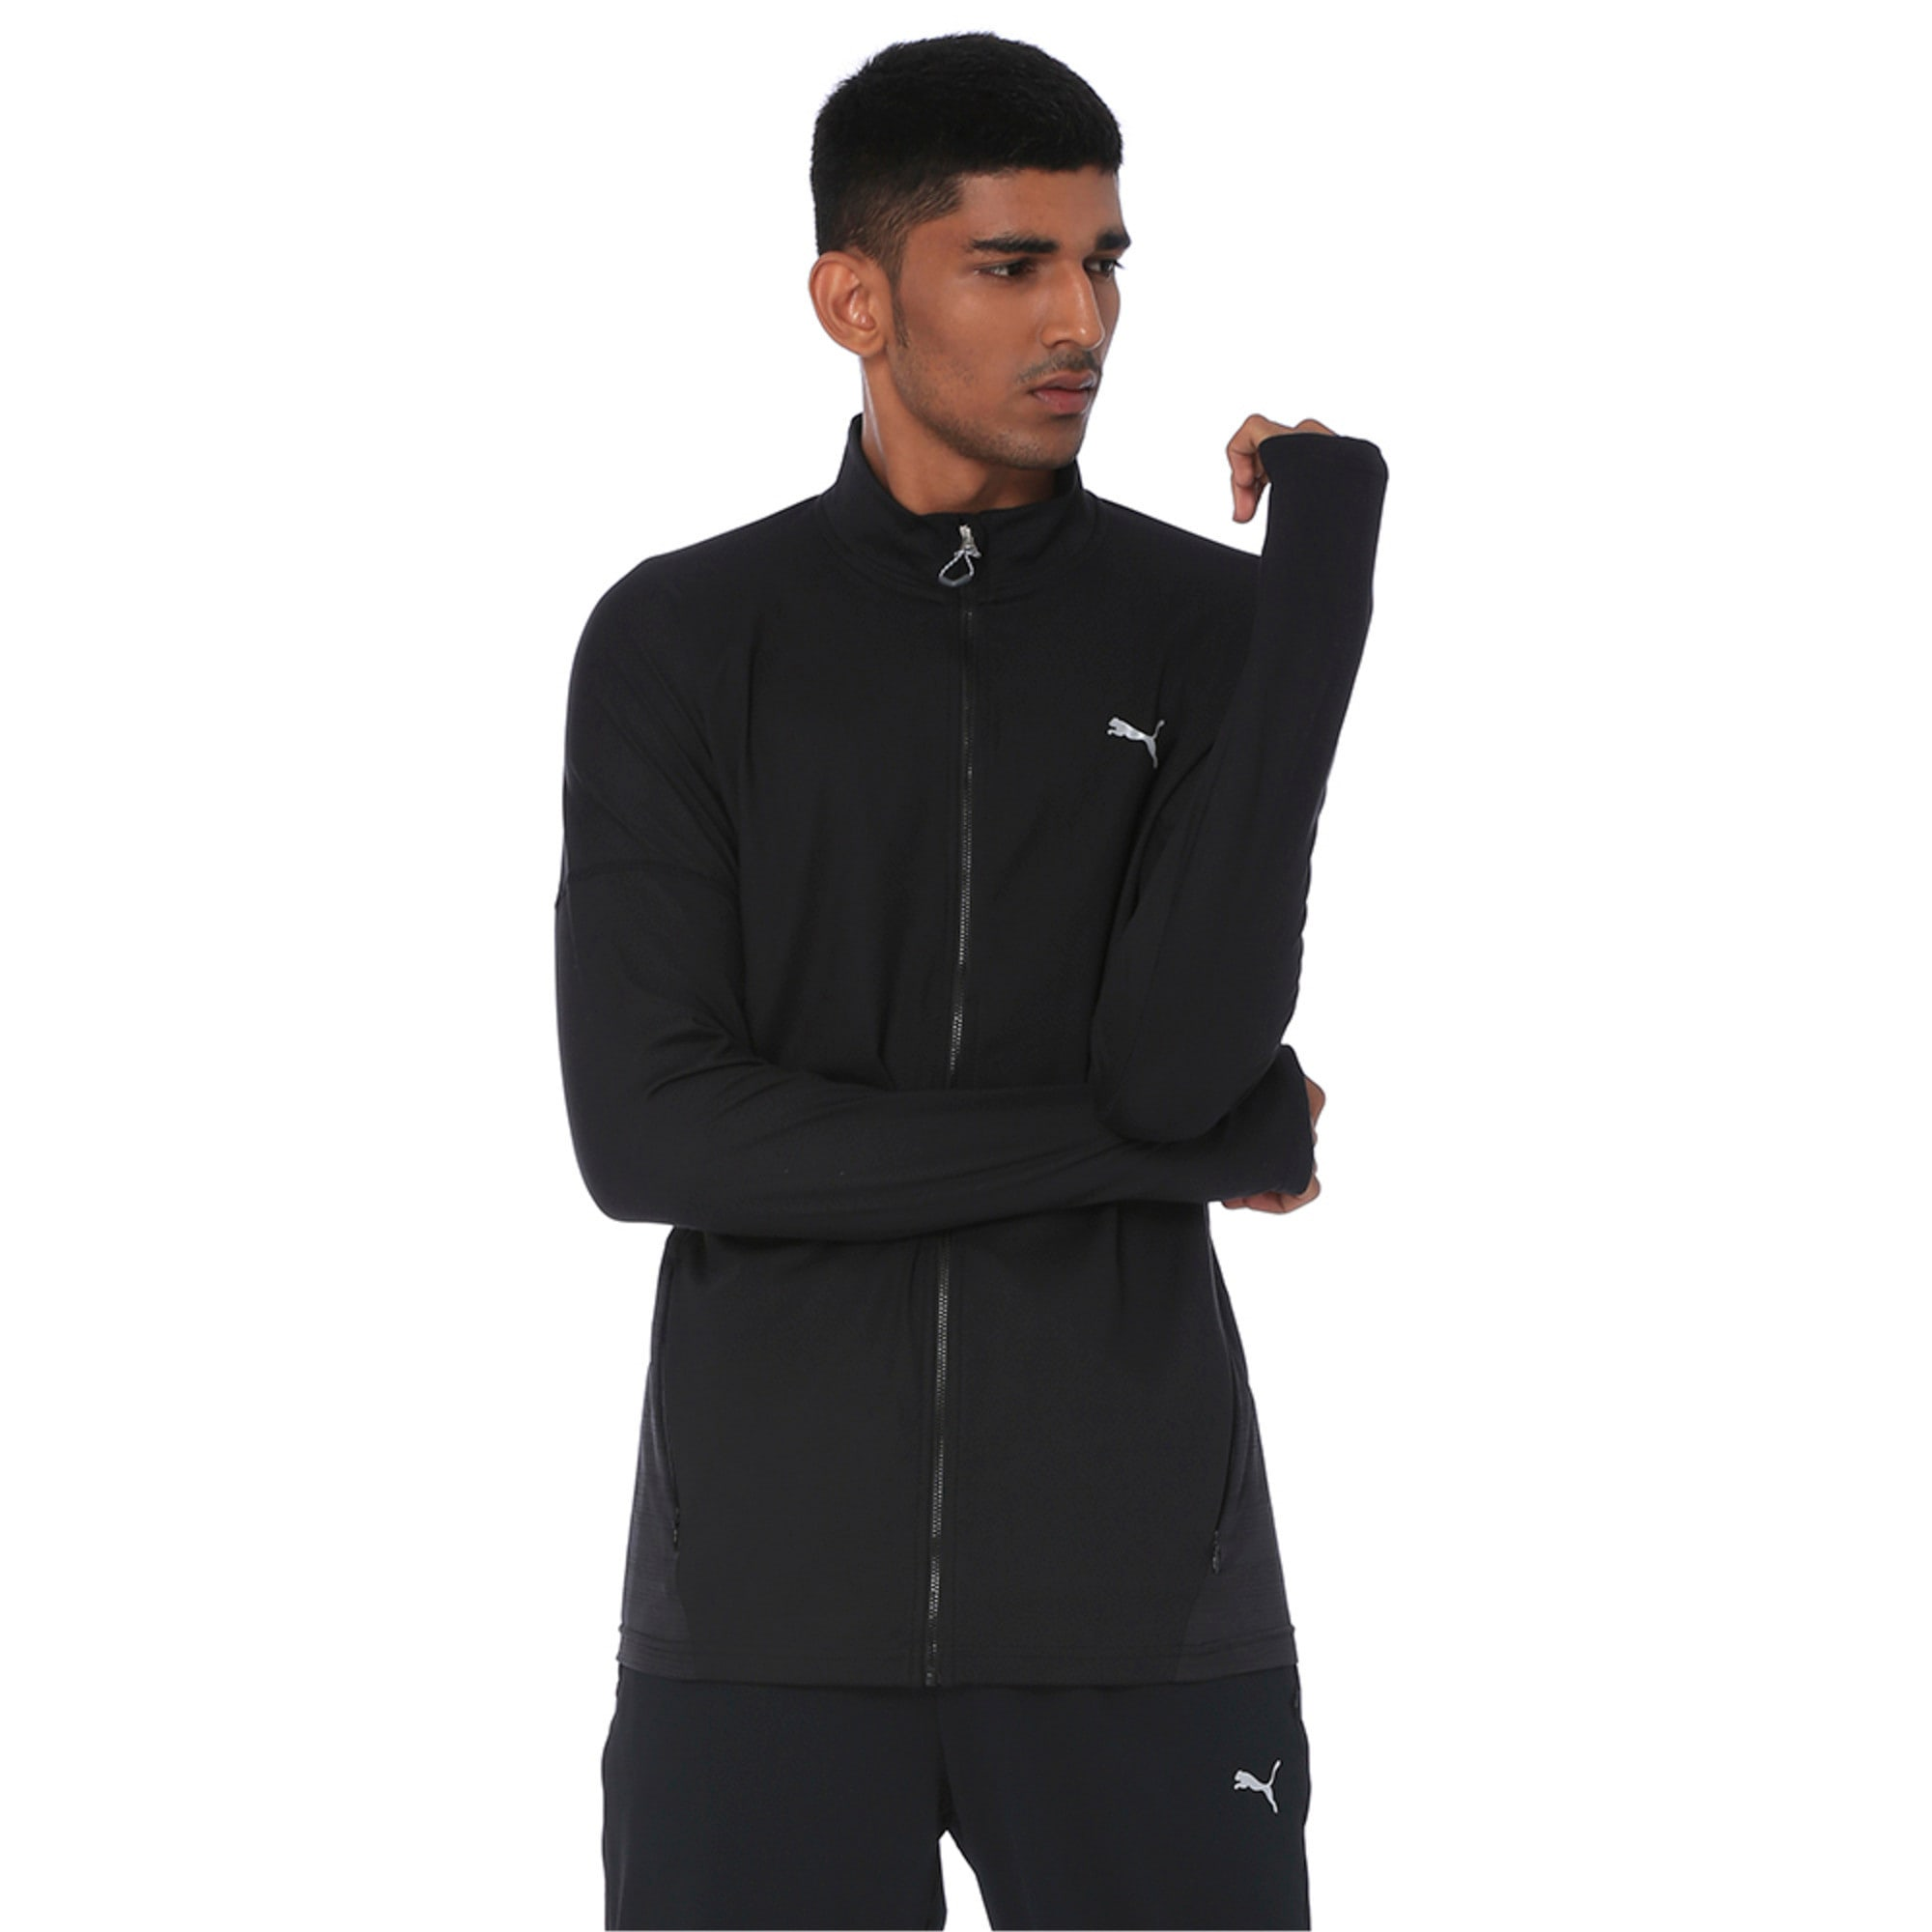 Thumbnail 4 of one8 VK Active Men's Full Zip Sweat Jacket, Puma Black, medium-IND